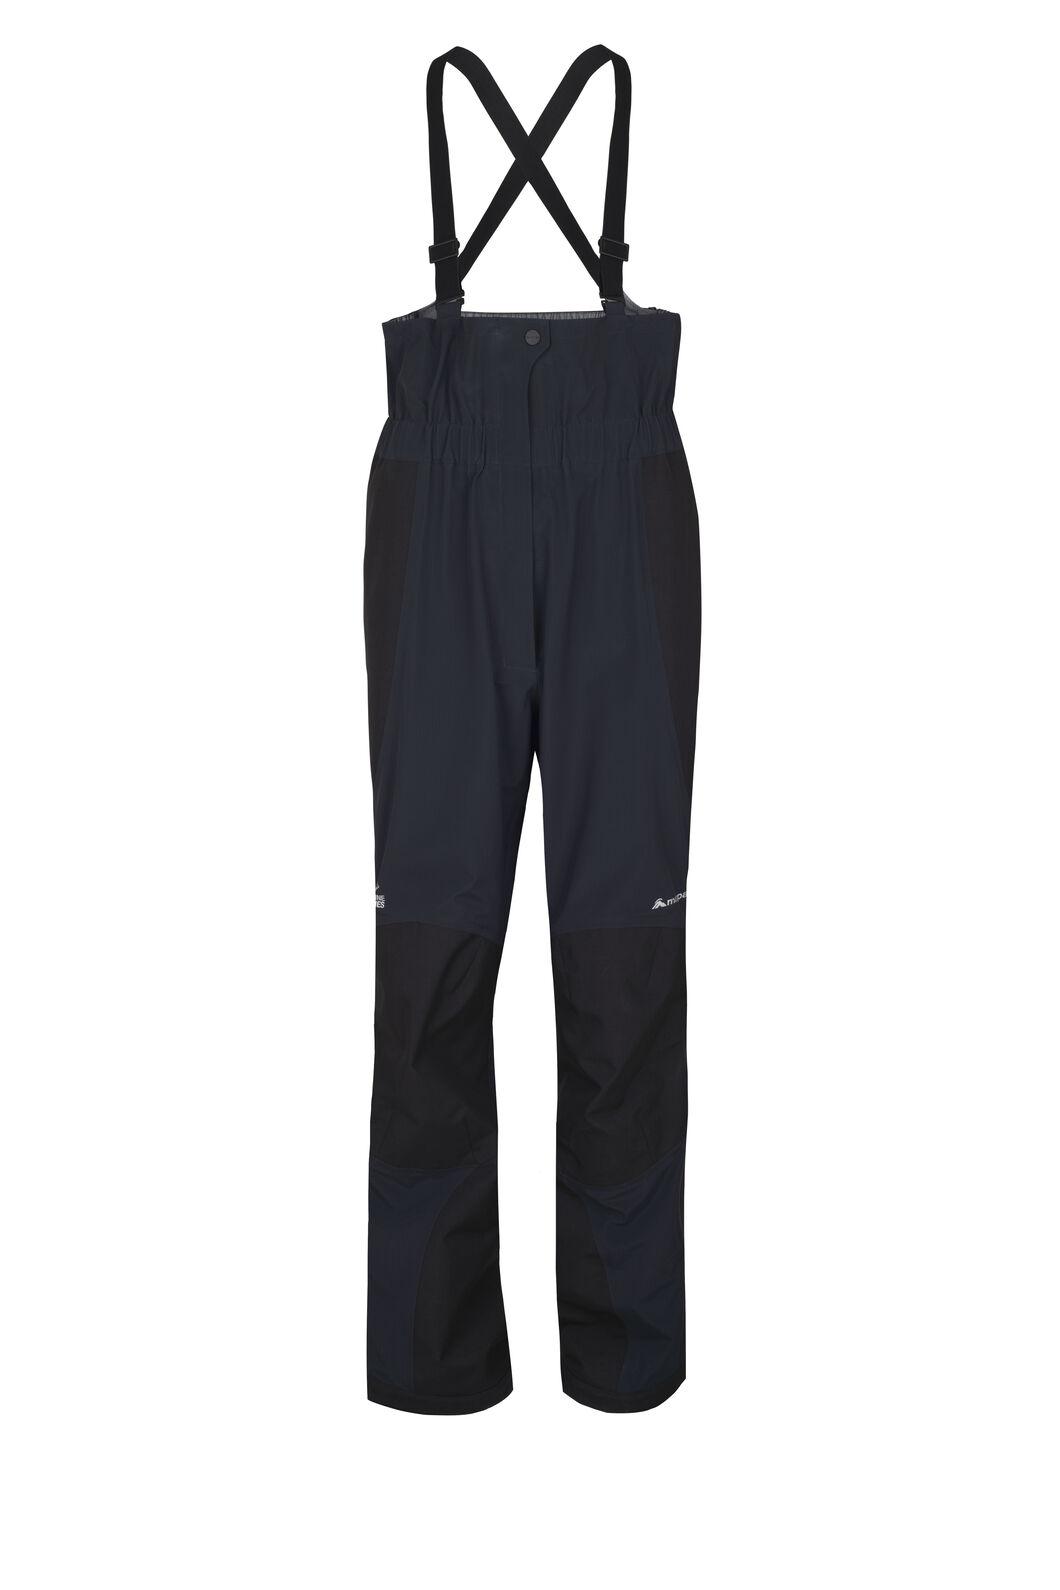 Macpac Barrier Bib Pertex® Rain Pants - Men's, Black, hi-res